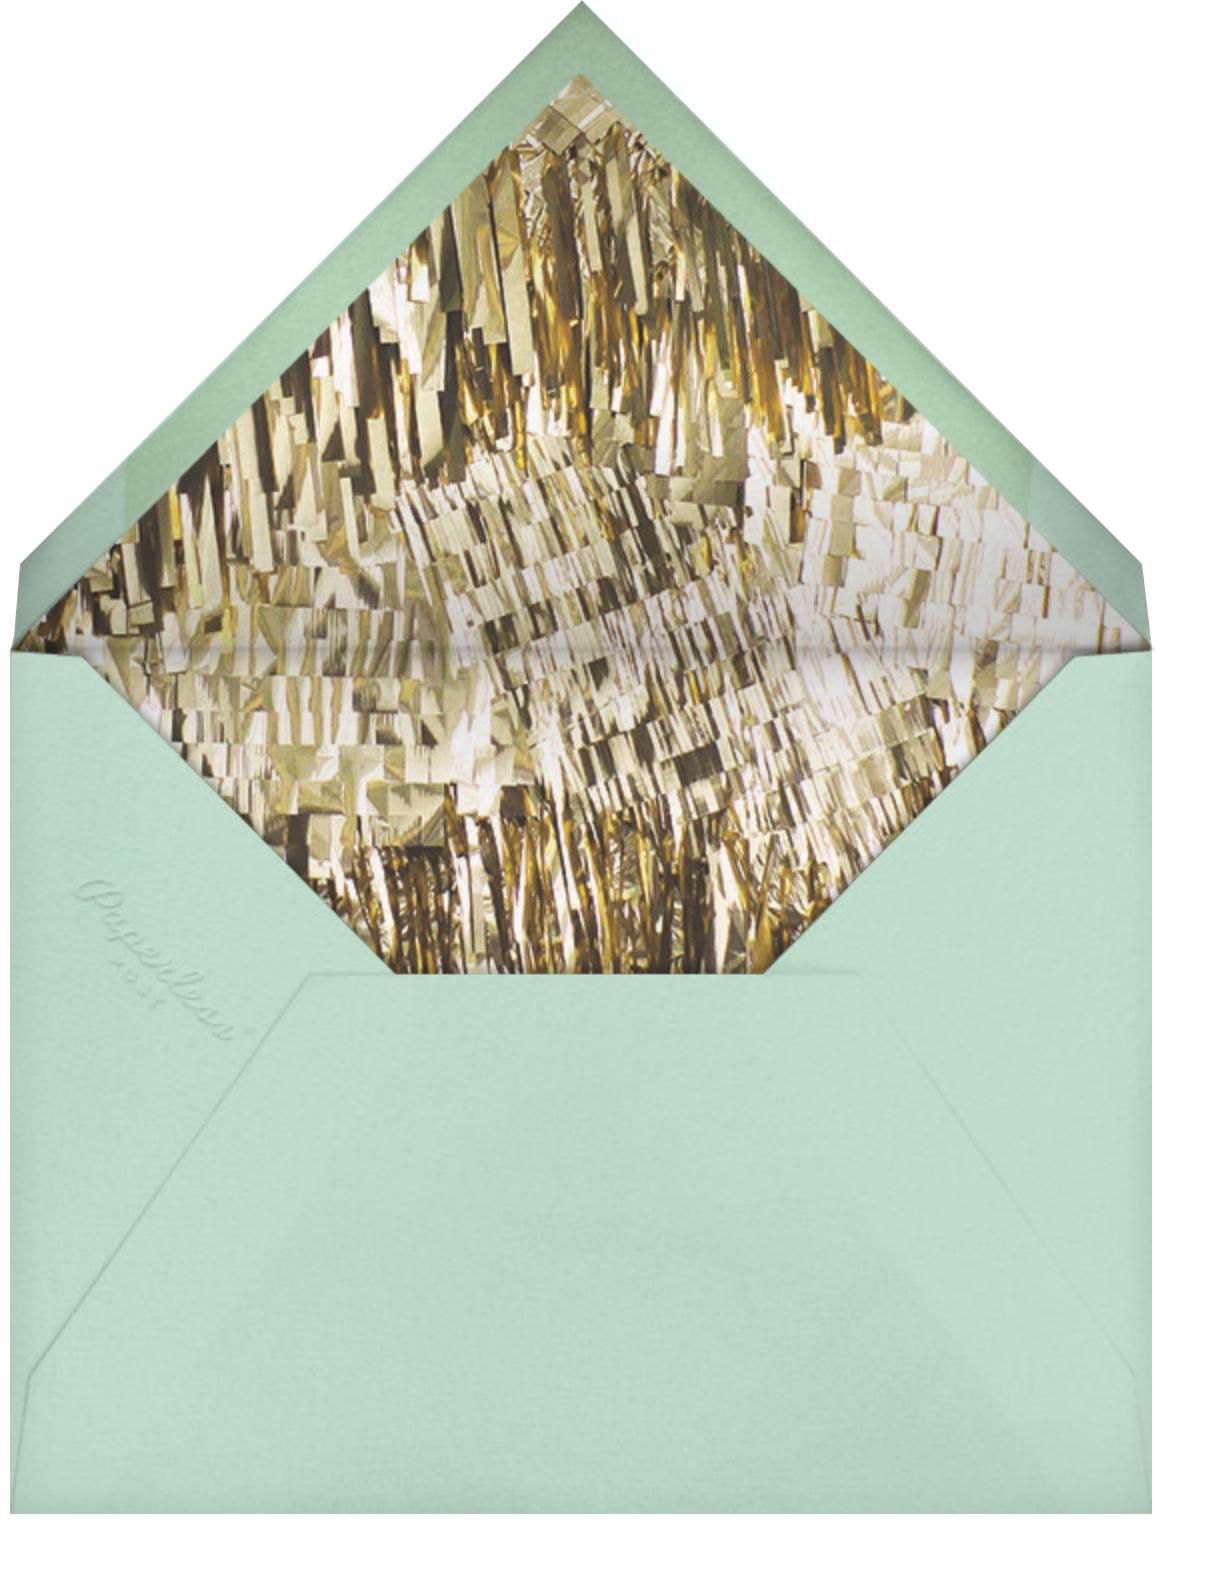 Glimmer Photo - Multi - CONFETTISYSTEM - Milestone  - envelope back